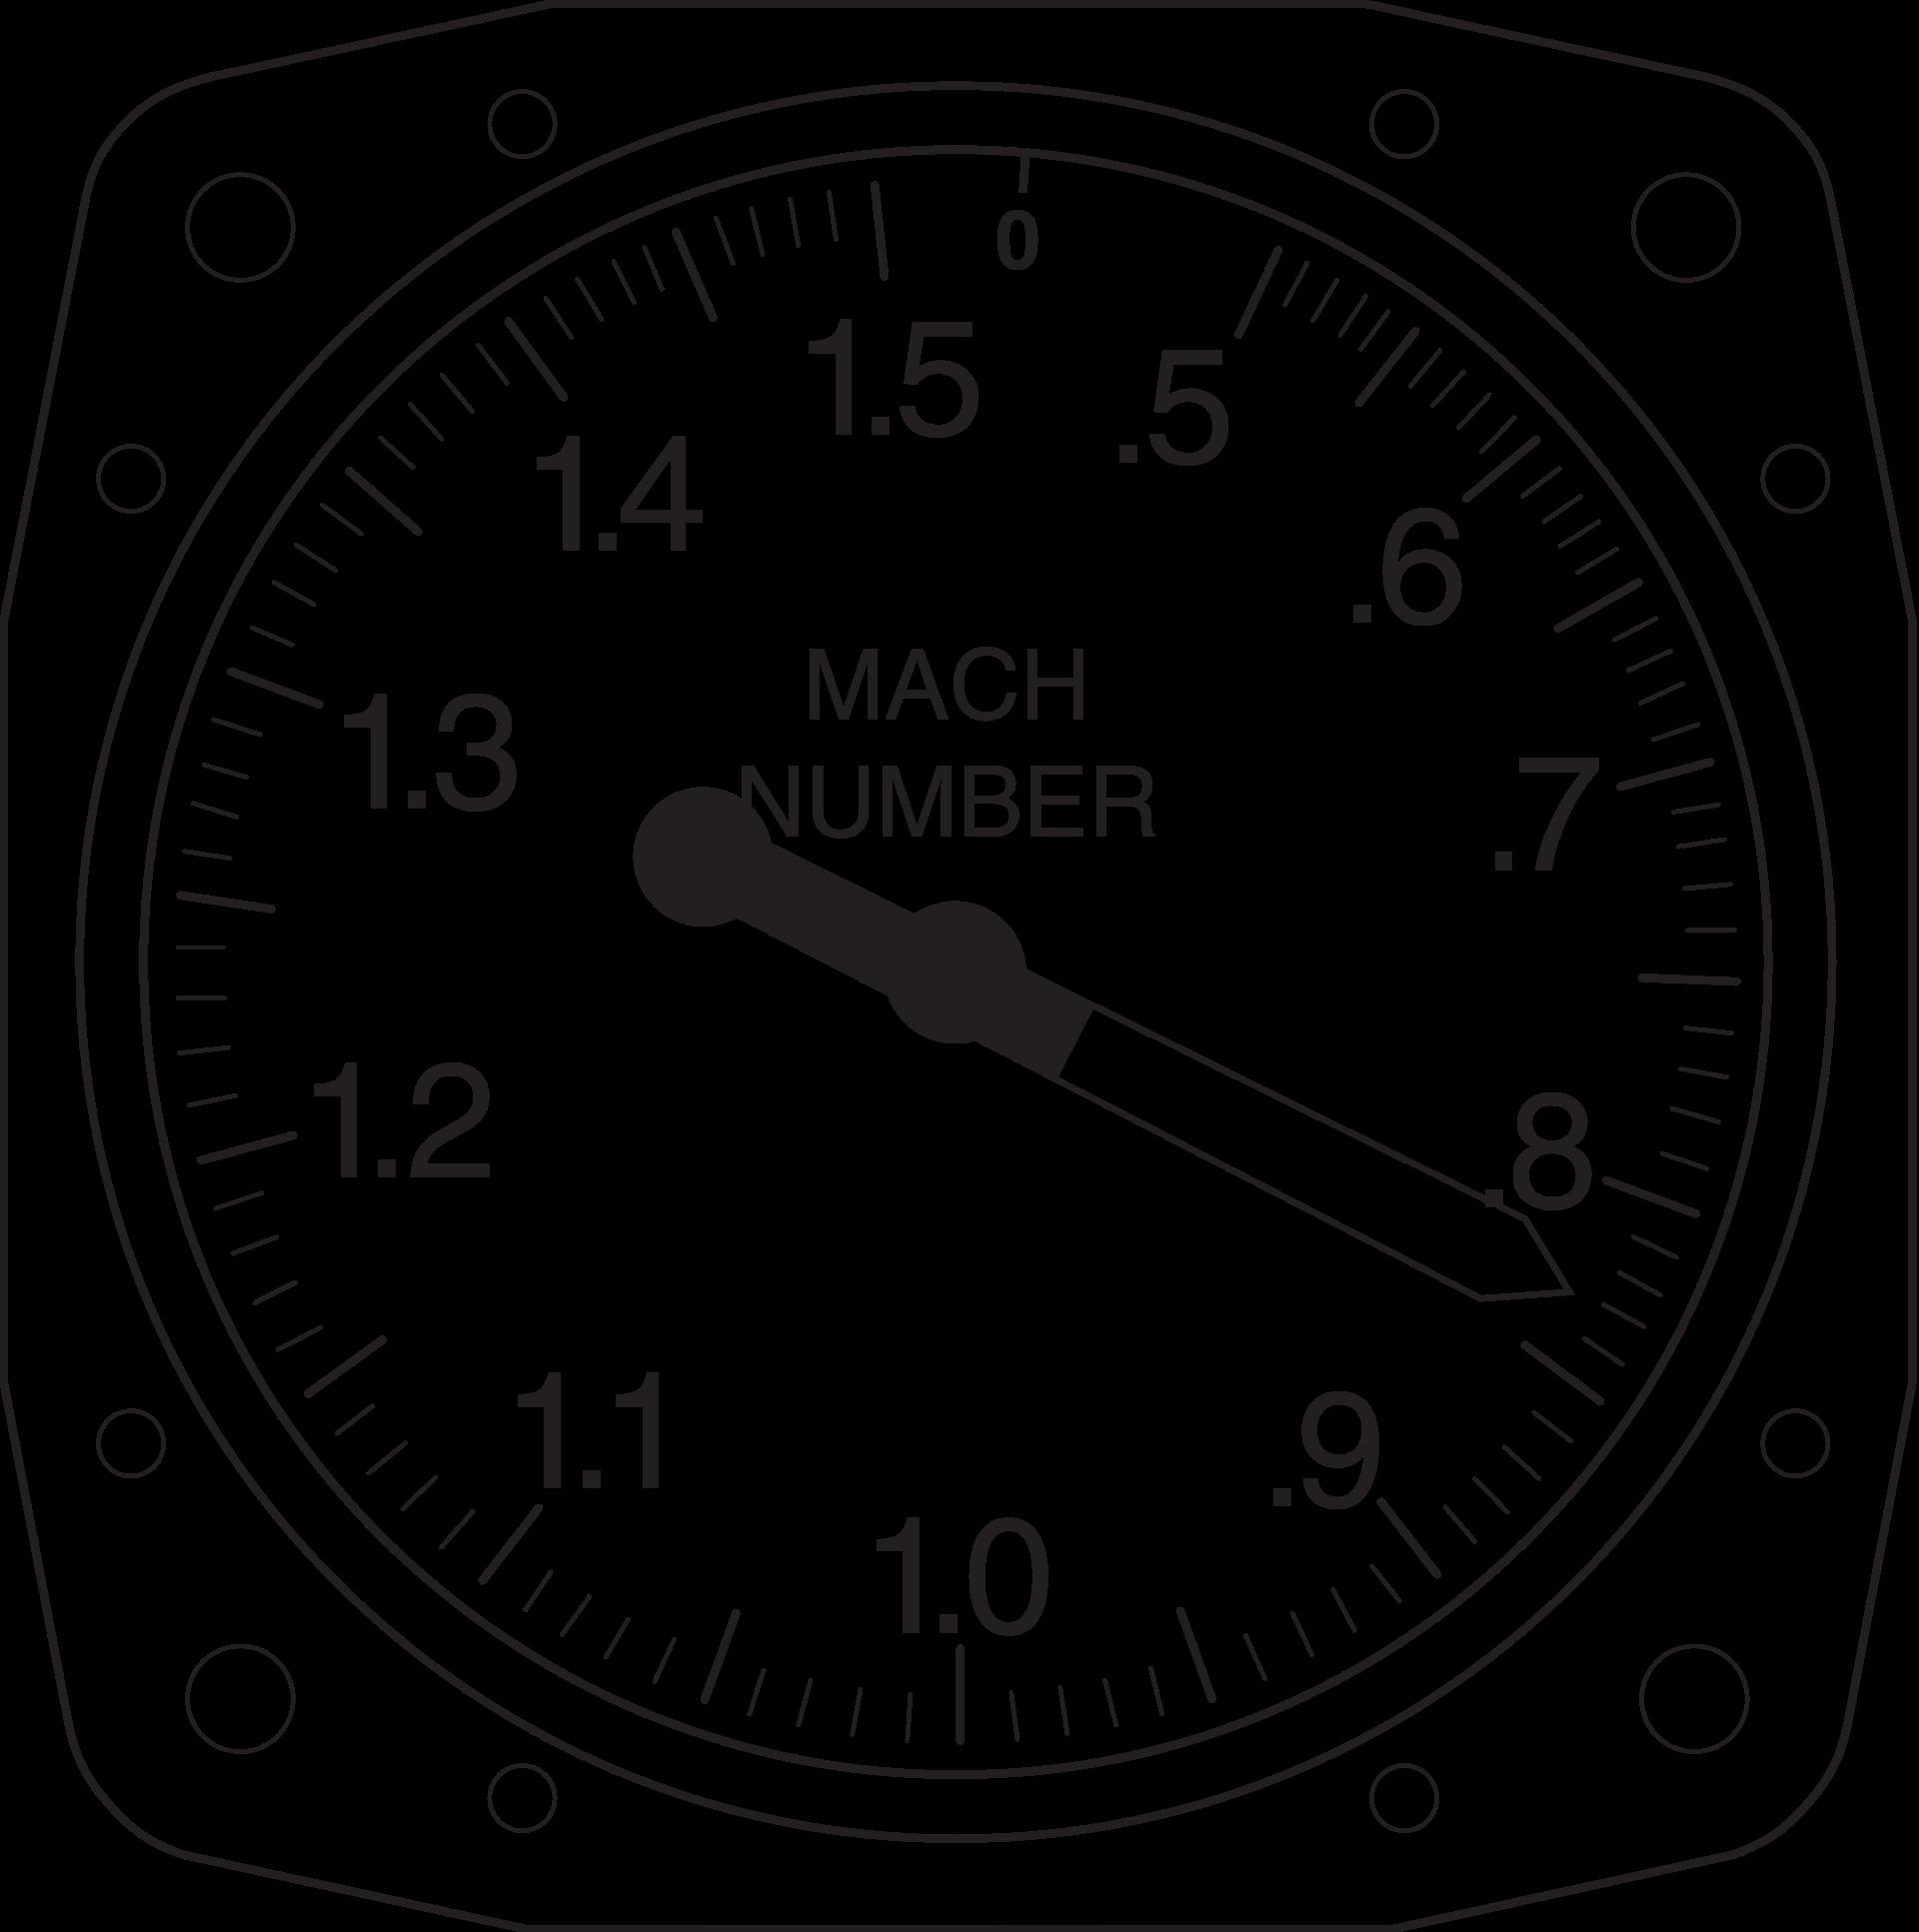 Machmeter Wikipedia